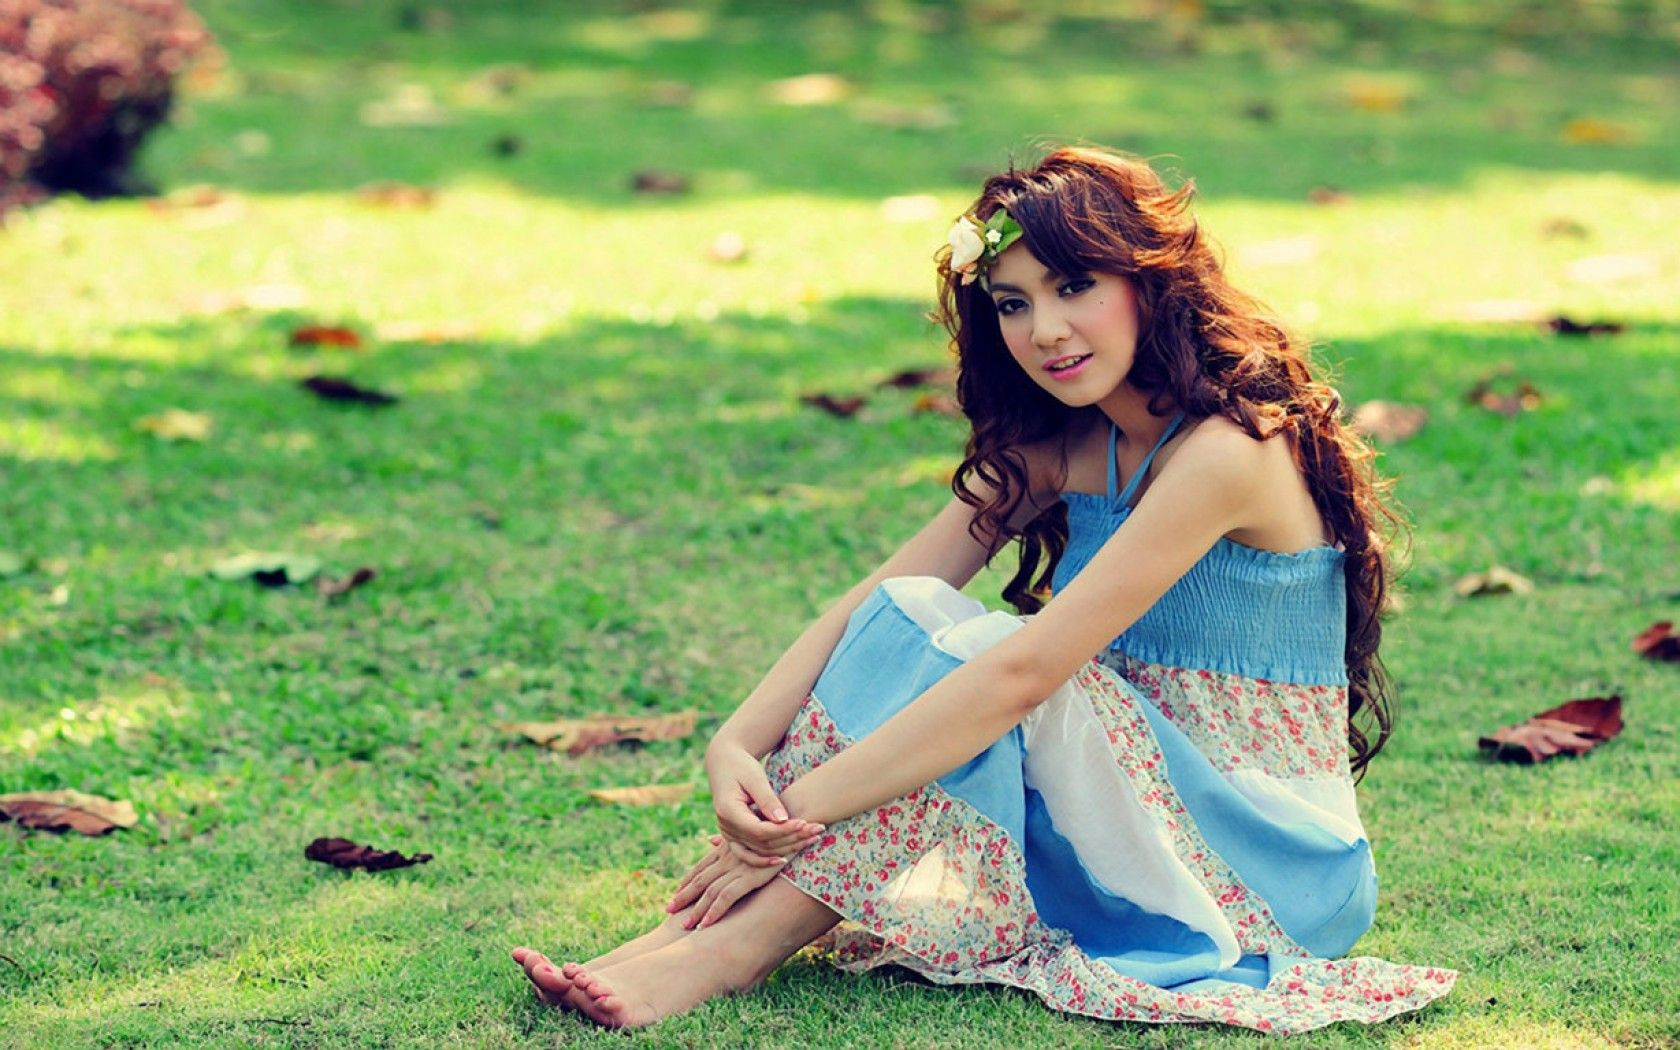 girl with flowers - Google'da Ara